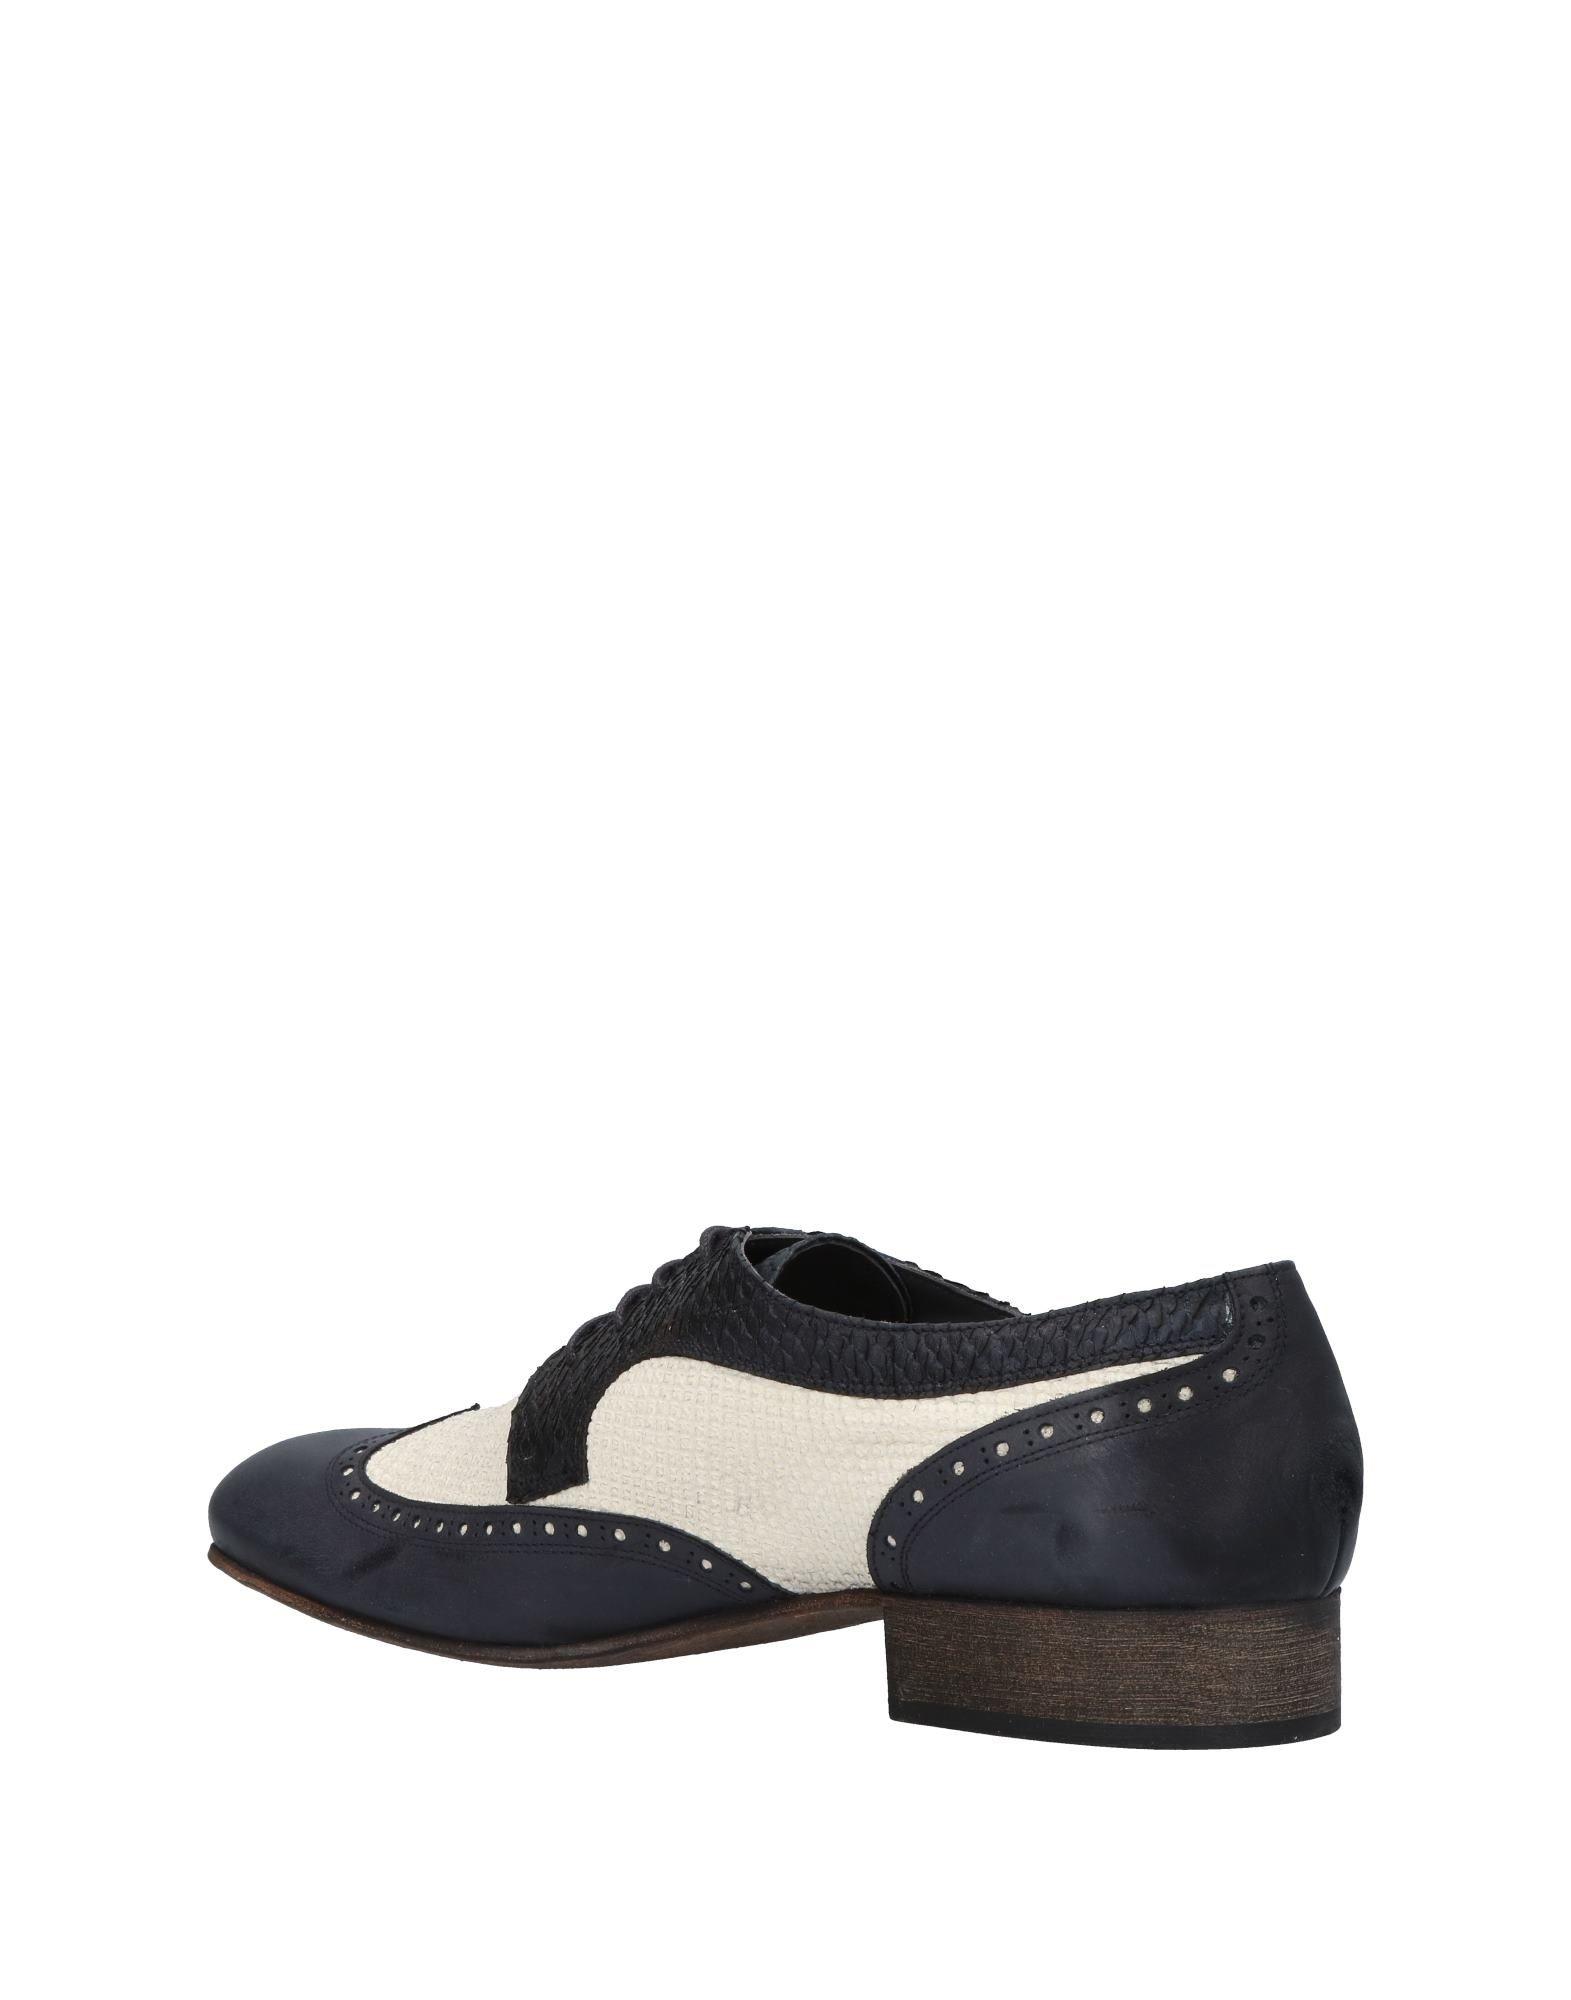 Chaussures - Tribunaux Le Marrine 6icb4